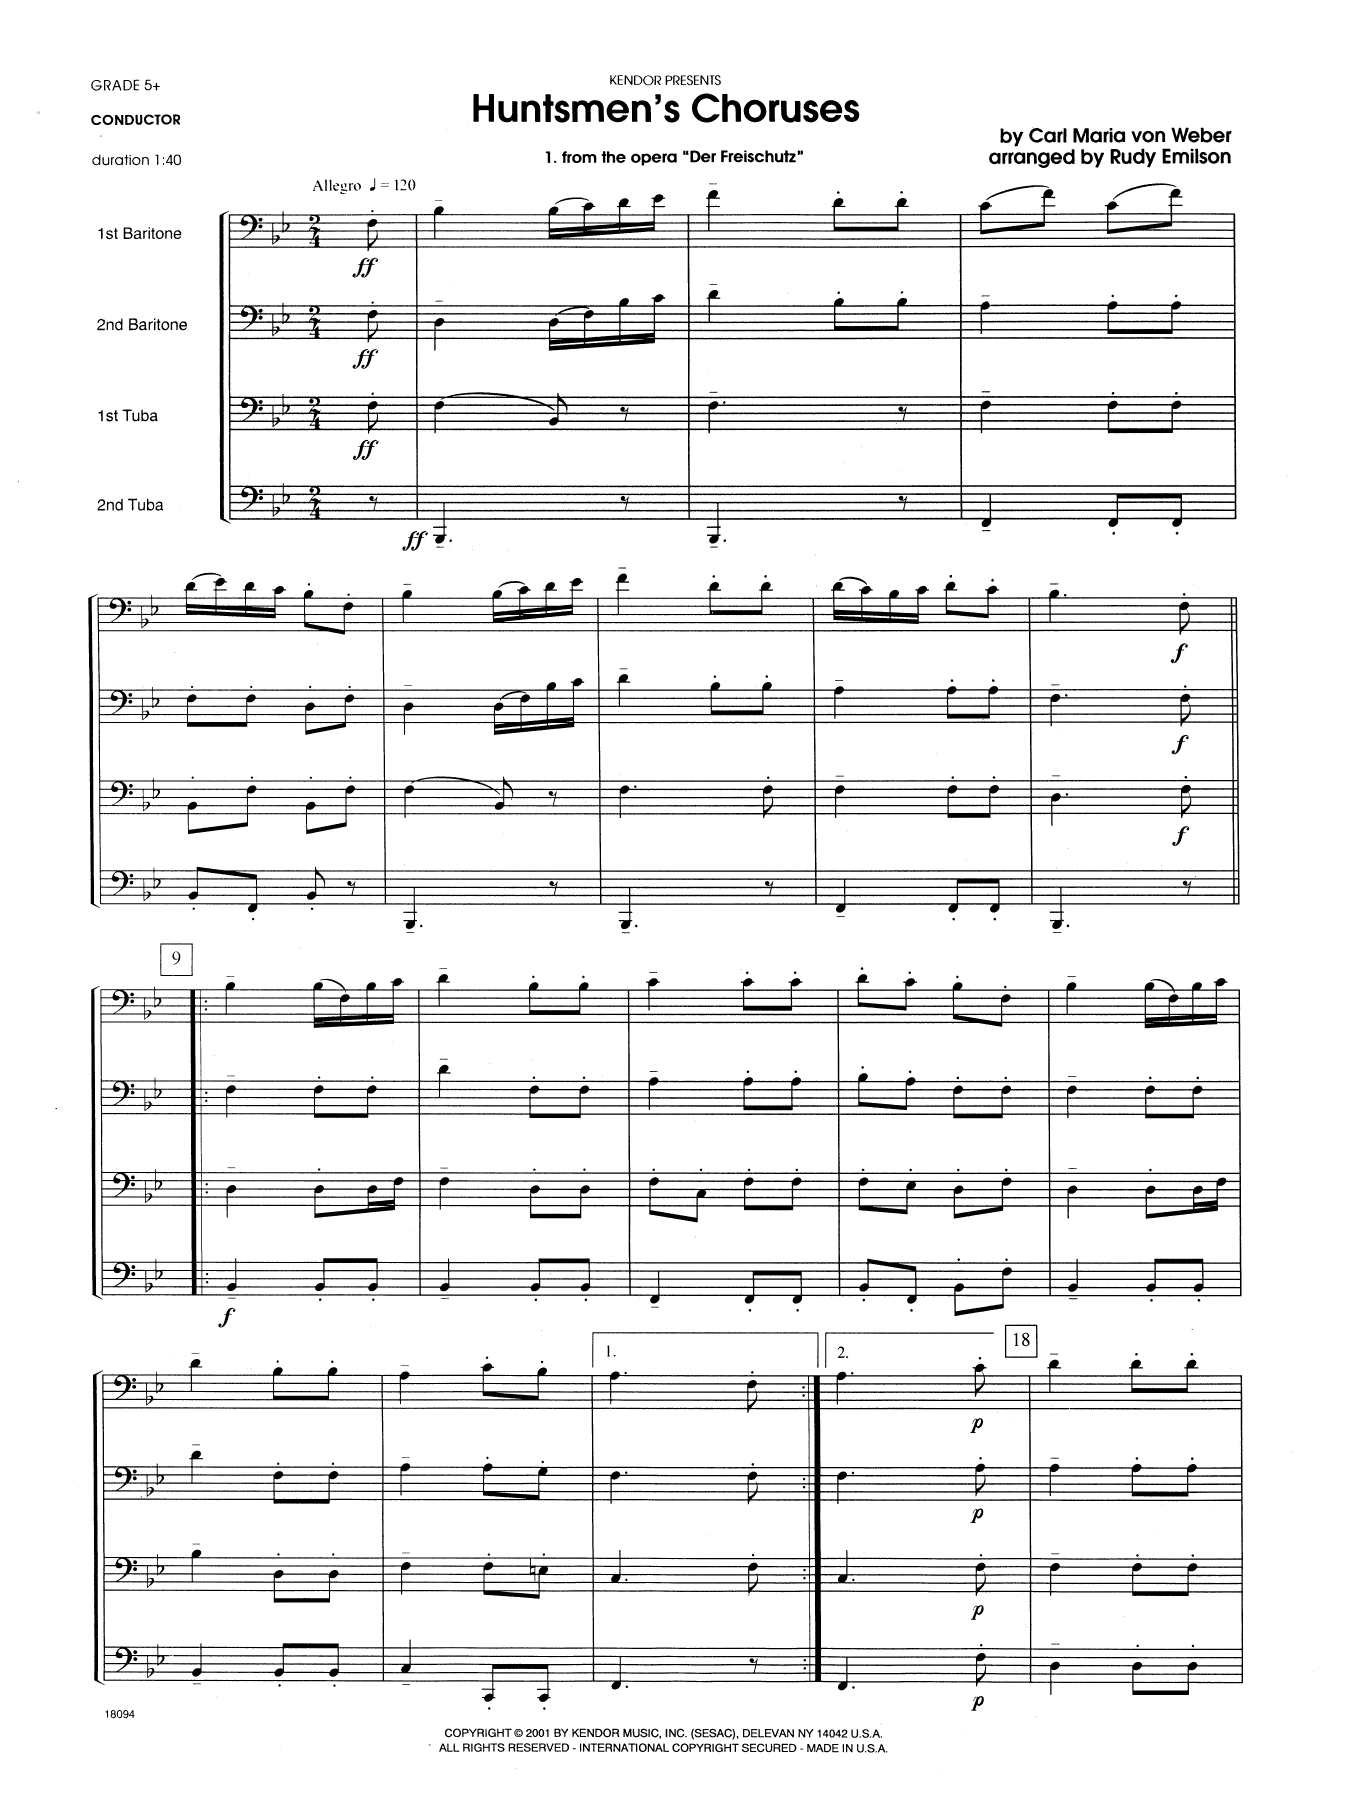 Huntsmen's Choruses (COMPLETE) sheet music for brass quartet by Rudy Emilson